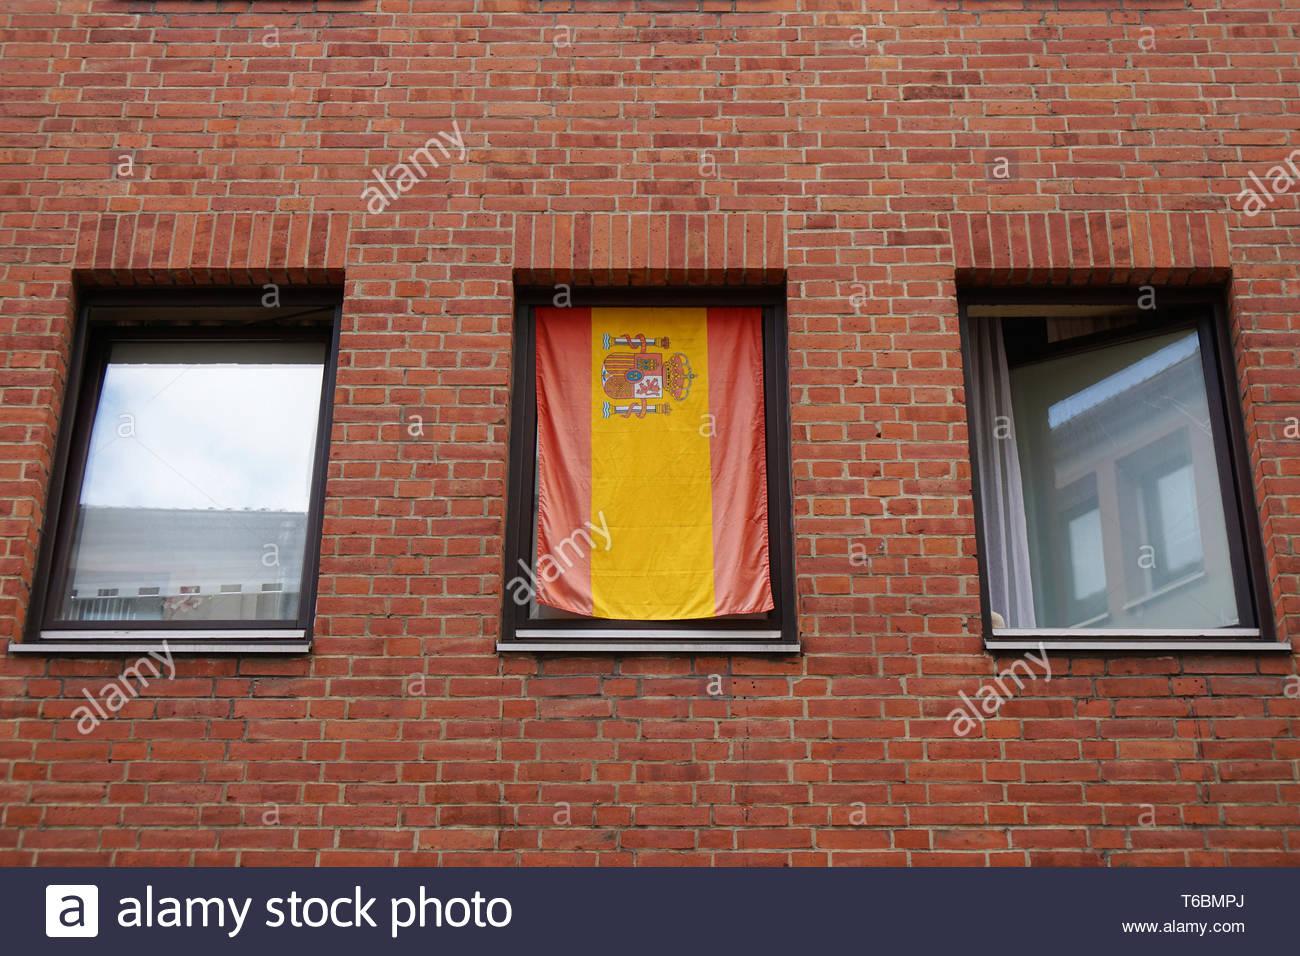 Spanish Flag In Window Stockfotos & Spanish Flag In Window